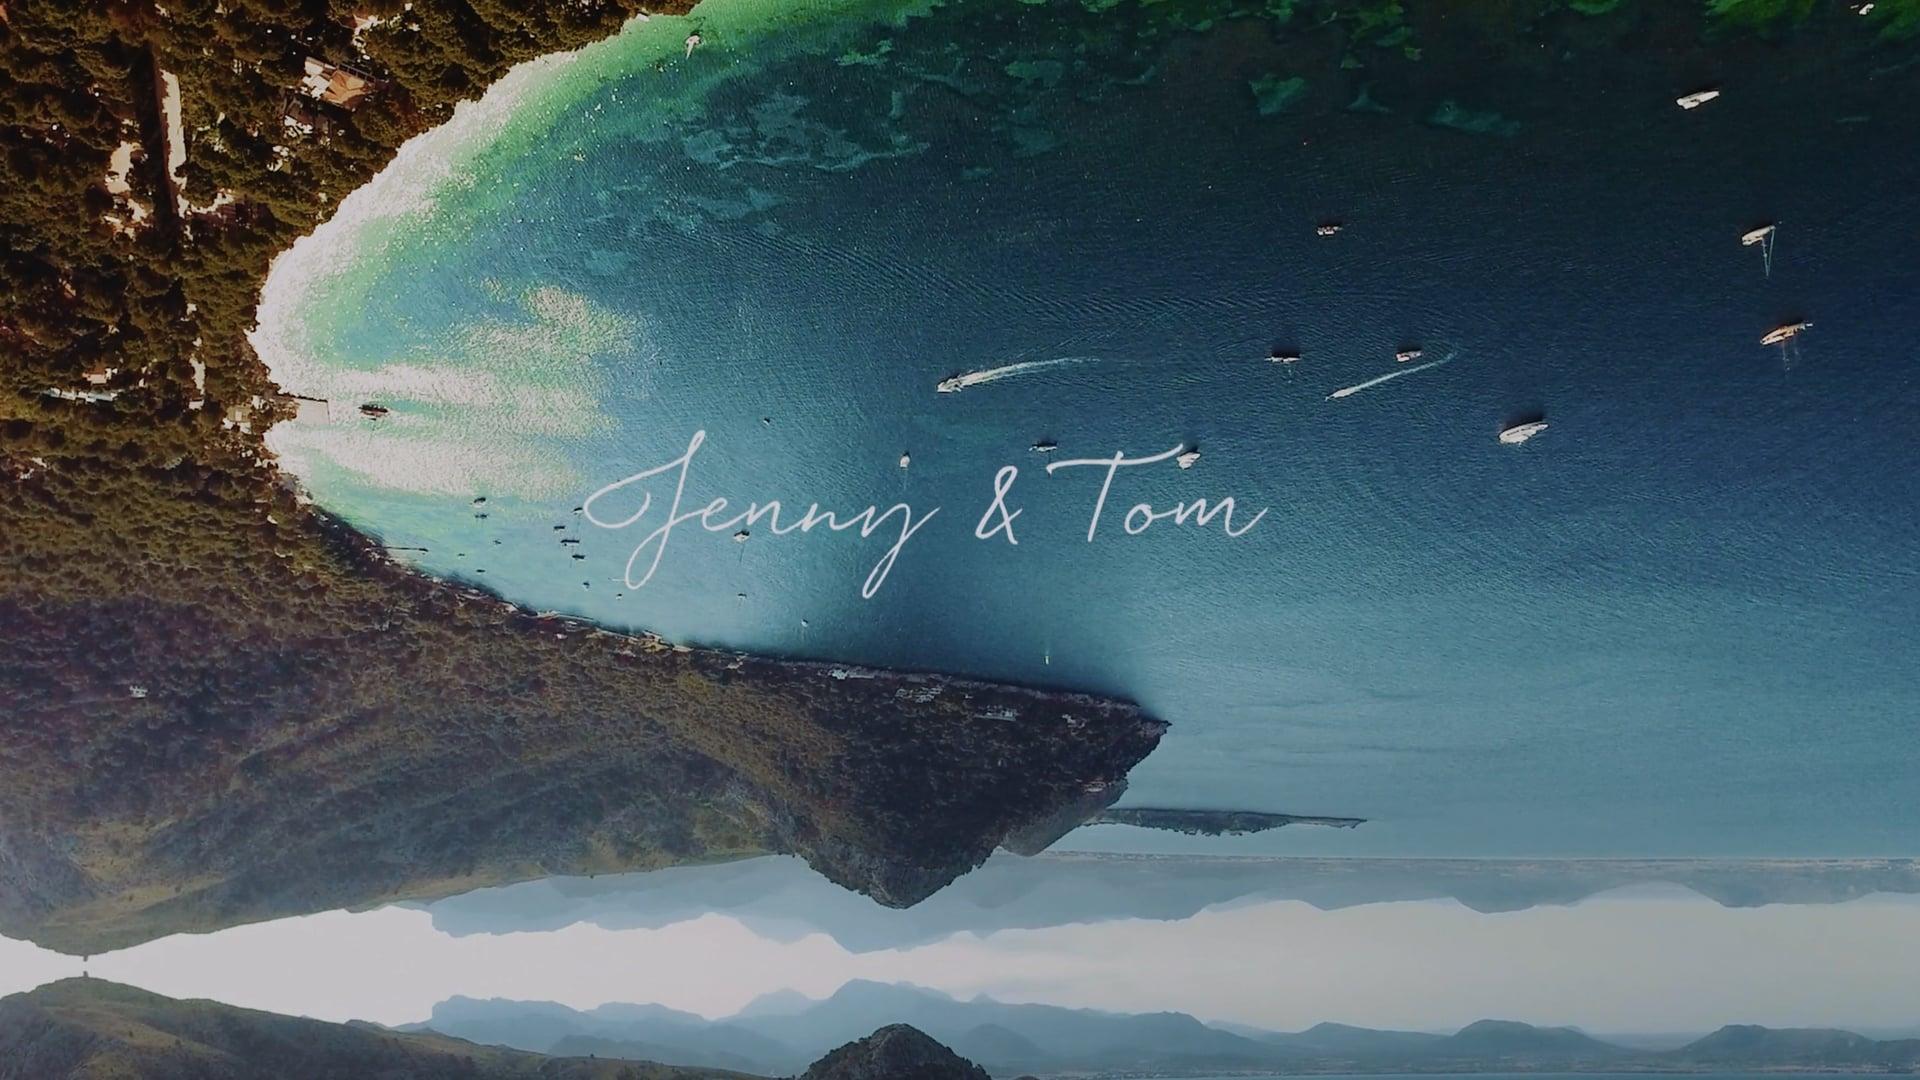 Jenny & Tom - Highlights